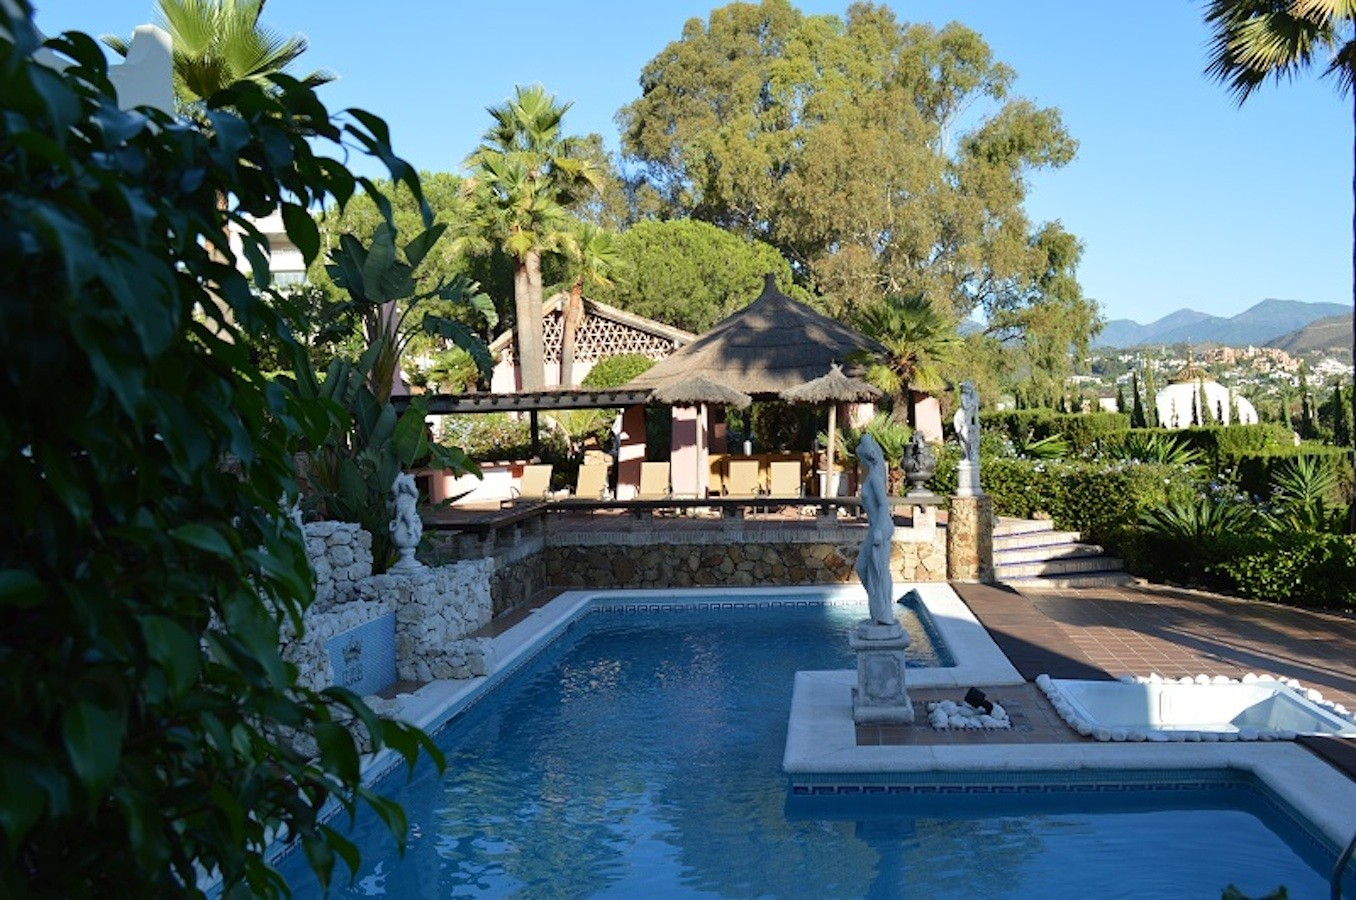 location villa m laga andaluc a maison espagne orestis. Black Bedroom Furniture Sets. Home Design Ideas